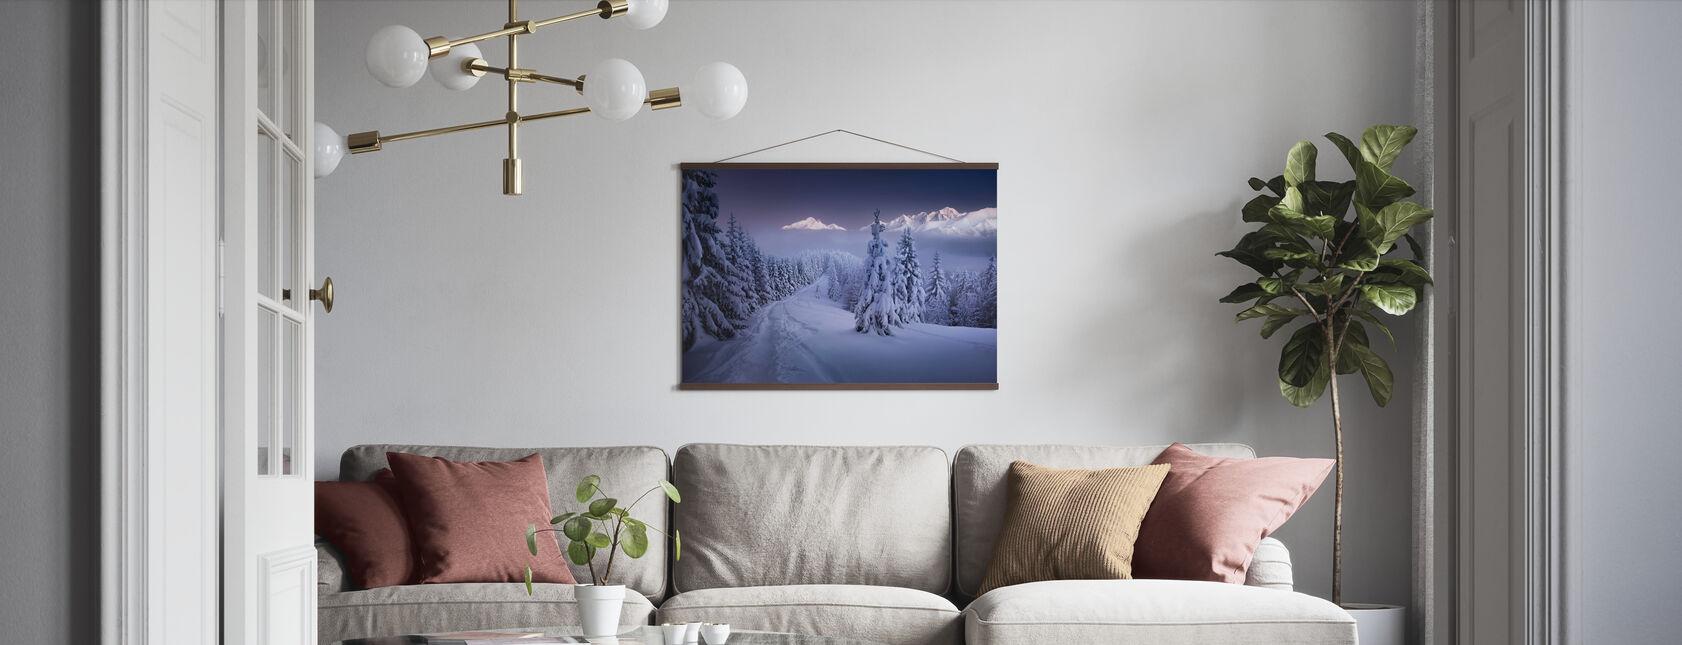 Talvella - Juliste - Olohuone